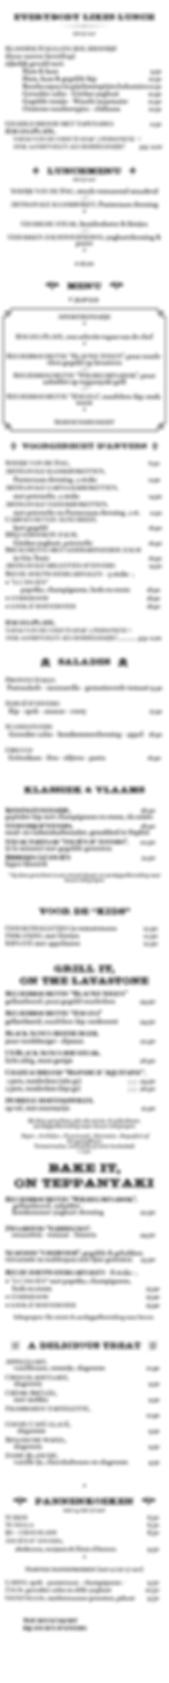 Ancièndanvers_menukaart_FOR_WEB_20191121